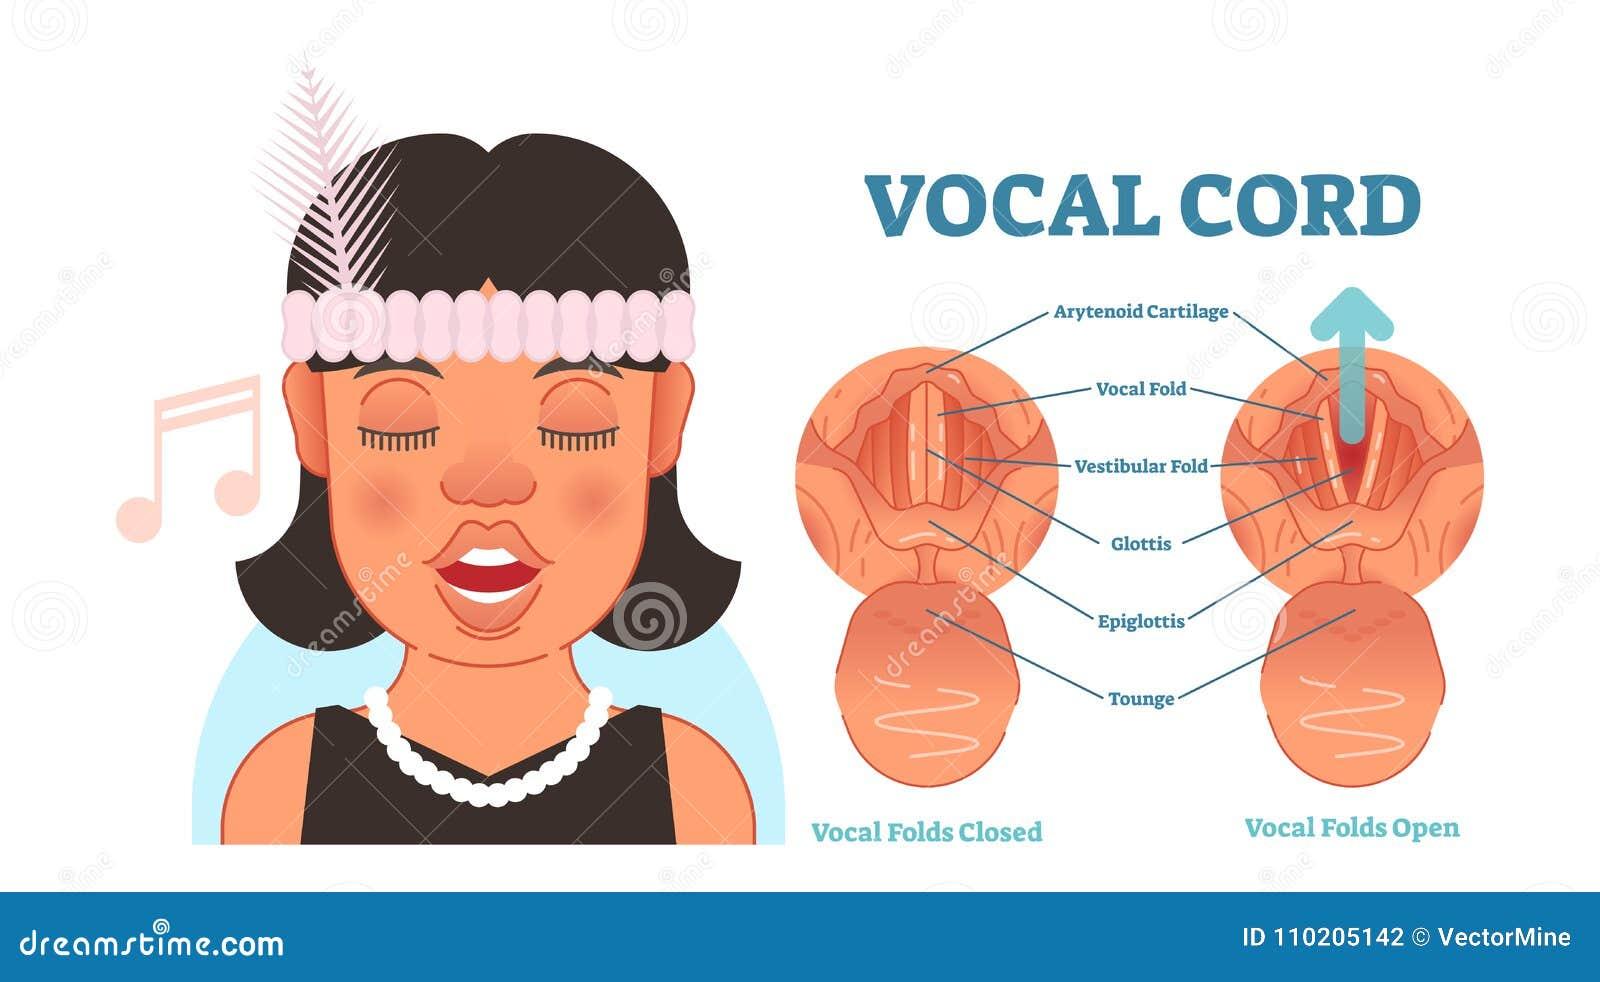 Vocal Cord Anatomy Vector Illustration Diagram, Educational Medical ...